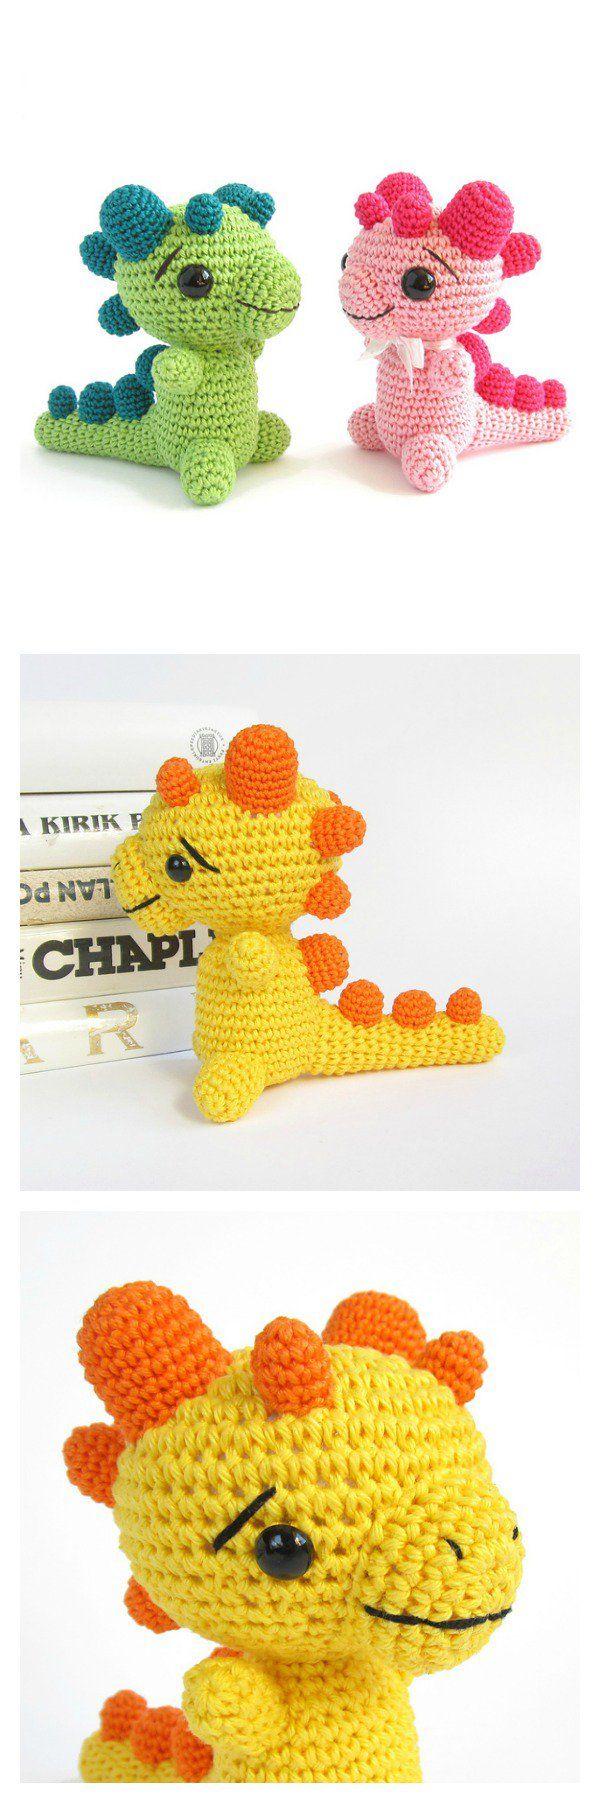 Crochet Amigurumi Dinosaur Free Patterns | Dinosaurier, Amigurumi ...